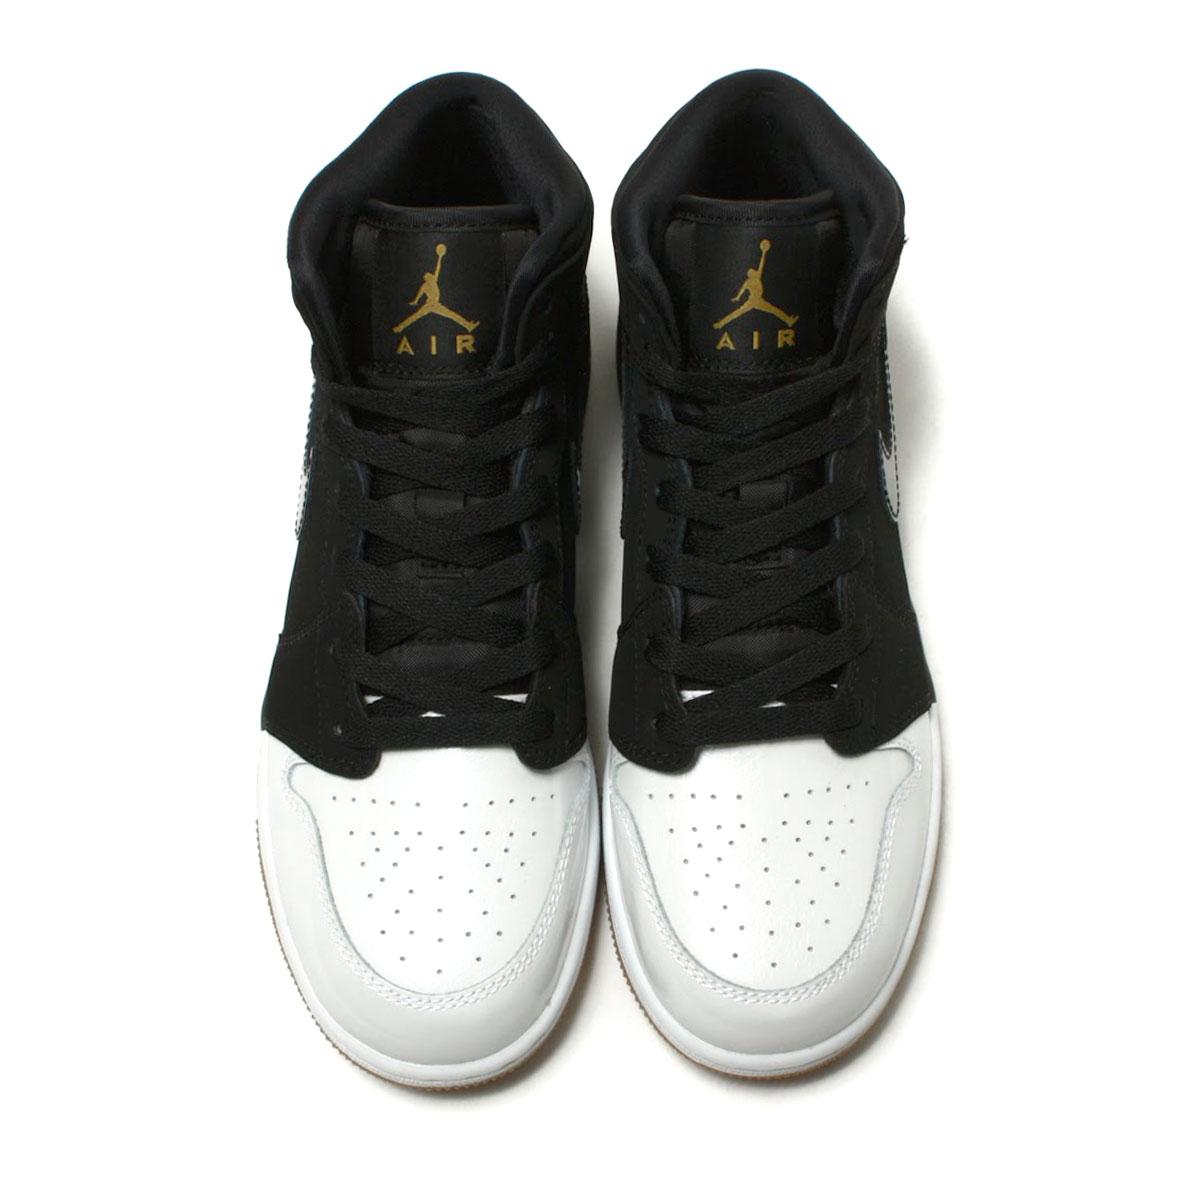 new concept e24a7 9f377 NIKE AIR JORDAN 1 MID GG (Nike Air Jordan 1 mid GG) BLACK METALLIC GOLD- WHITE-GUM MED BROWN 18SP-I